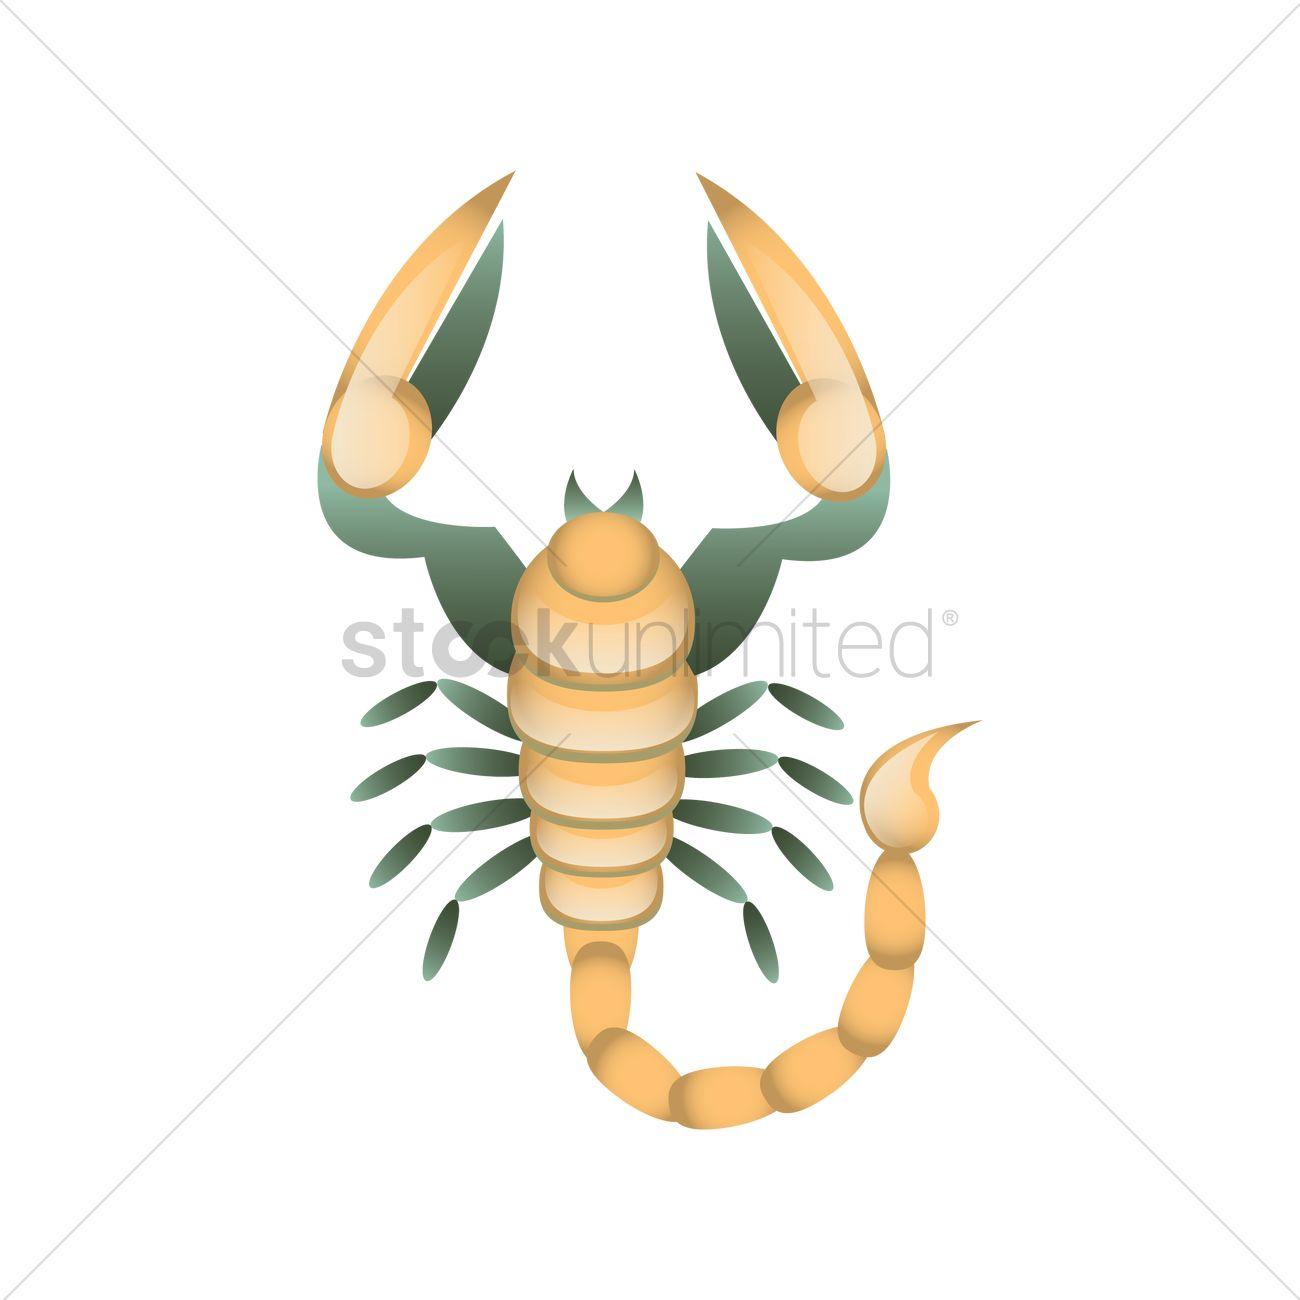 Scorpio horoscope design Vector Image - 1989305 | StockUnlimited